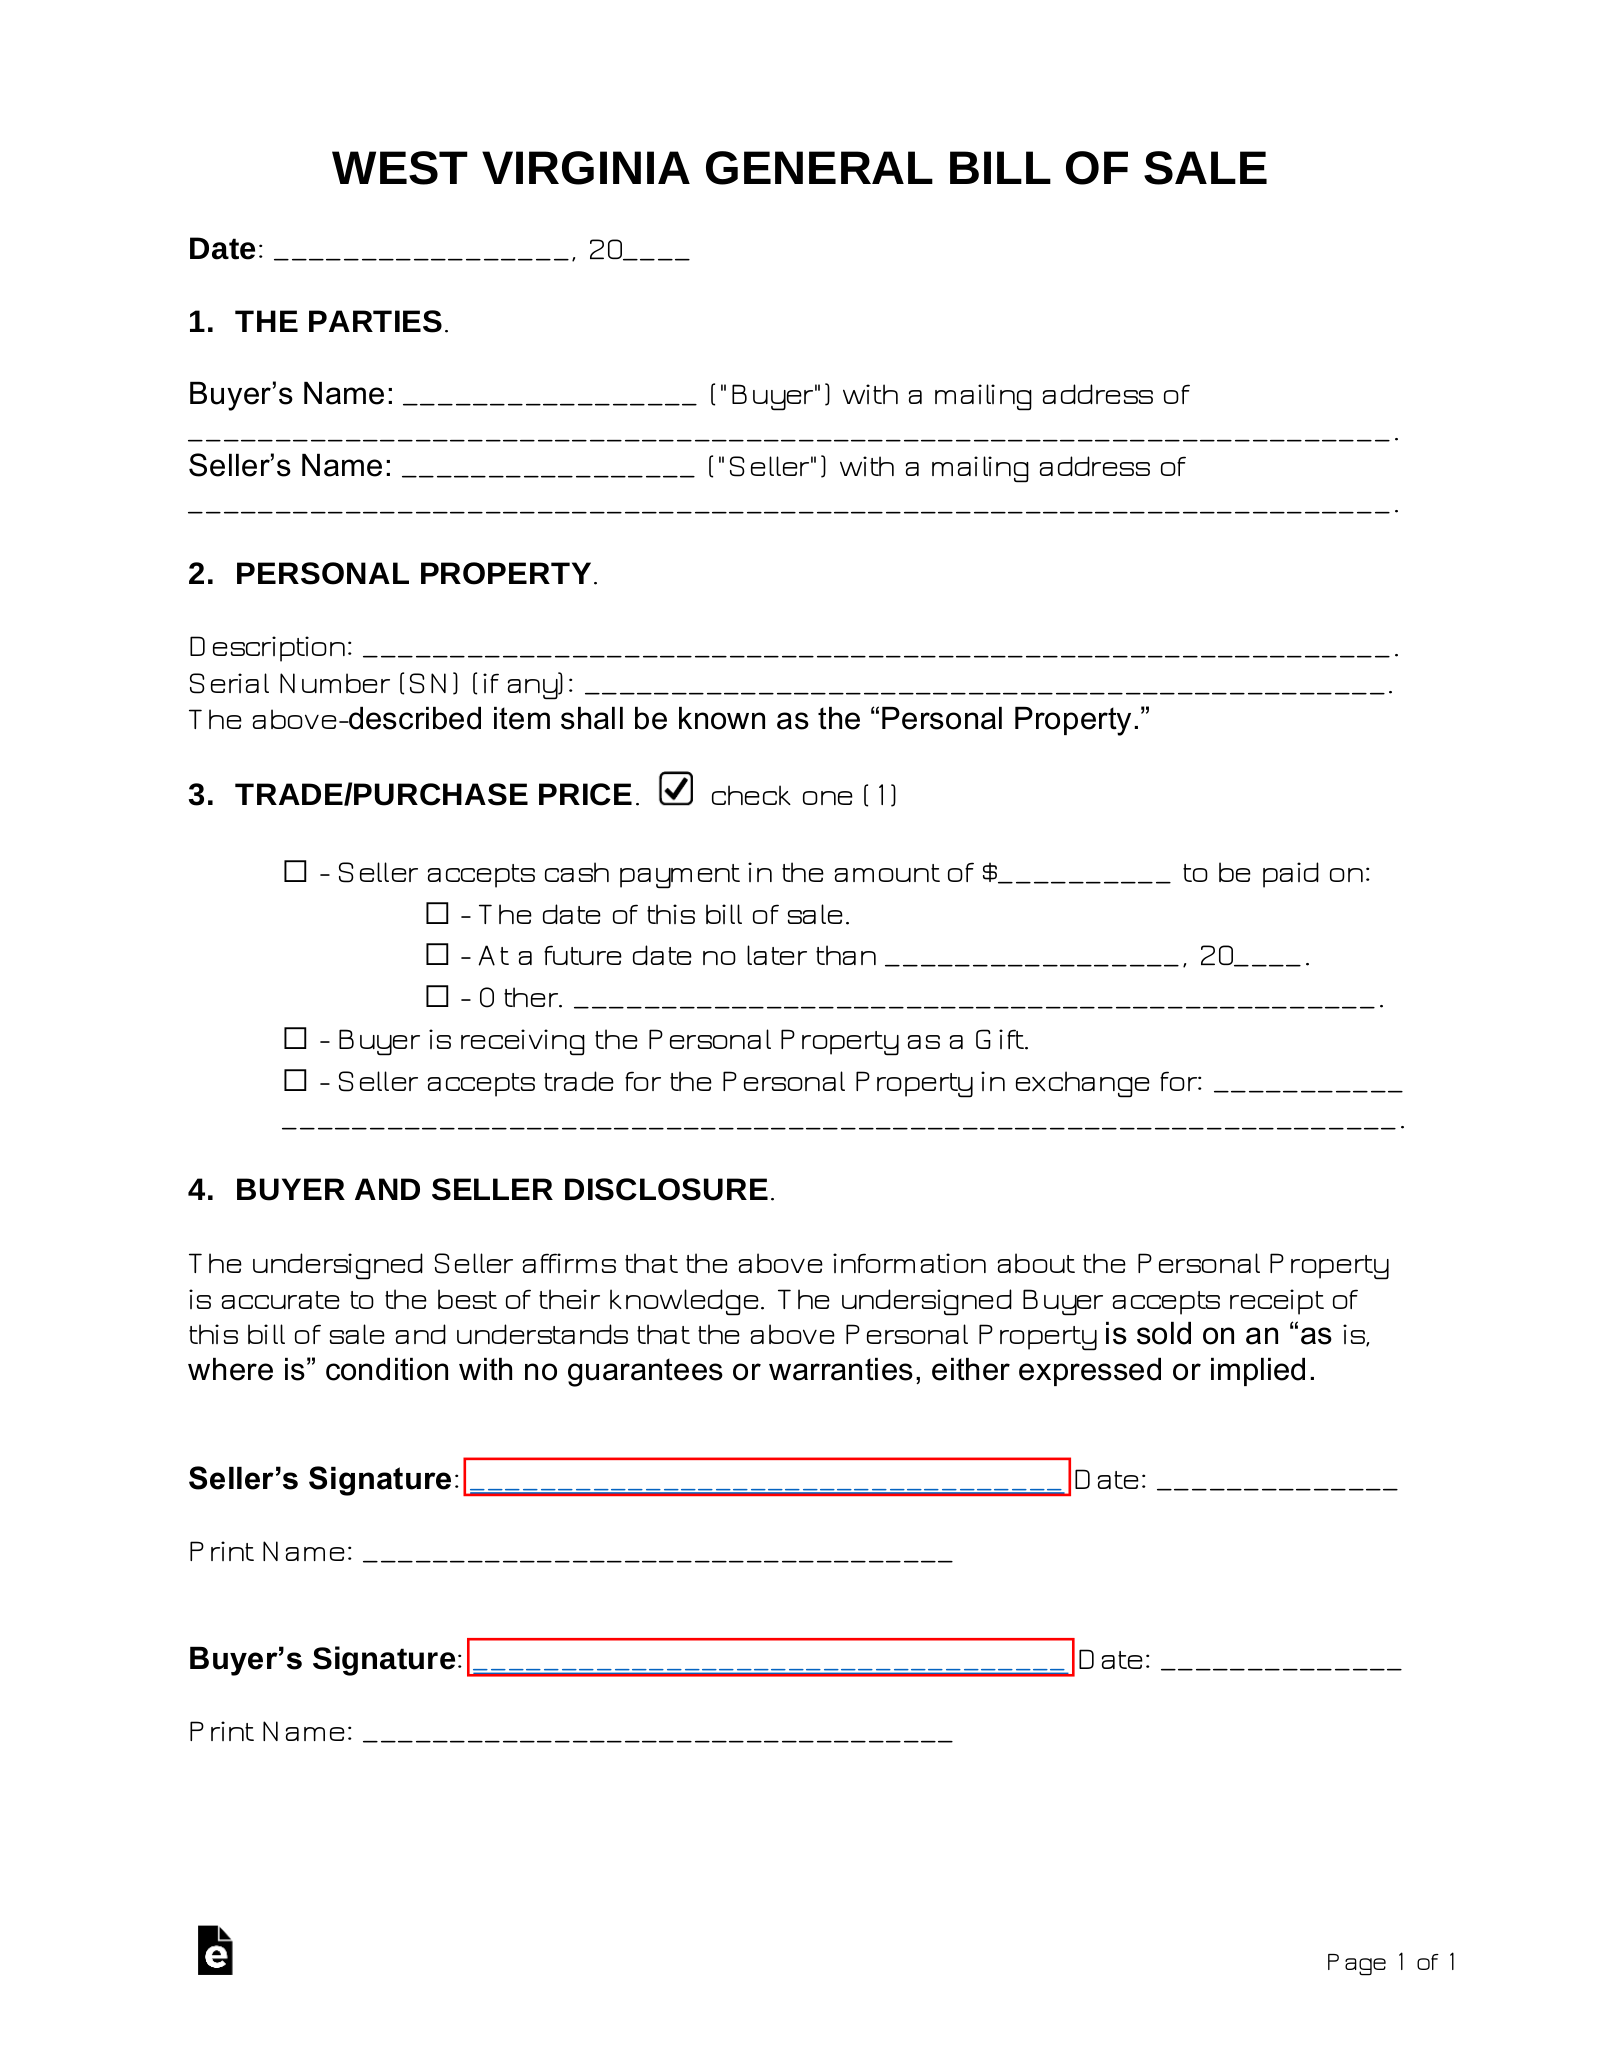 Free West Virginia General Bill Of Sale Form